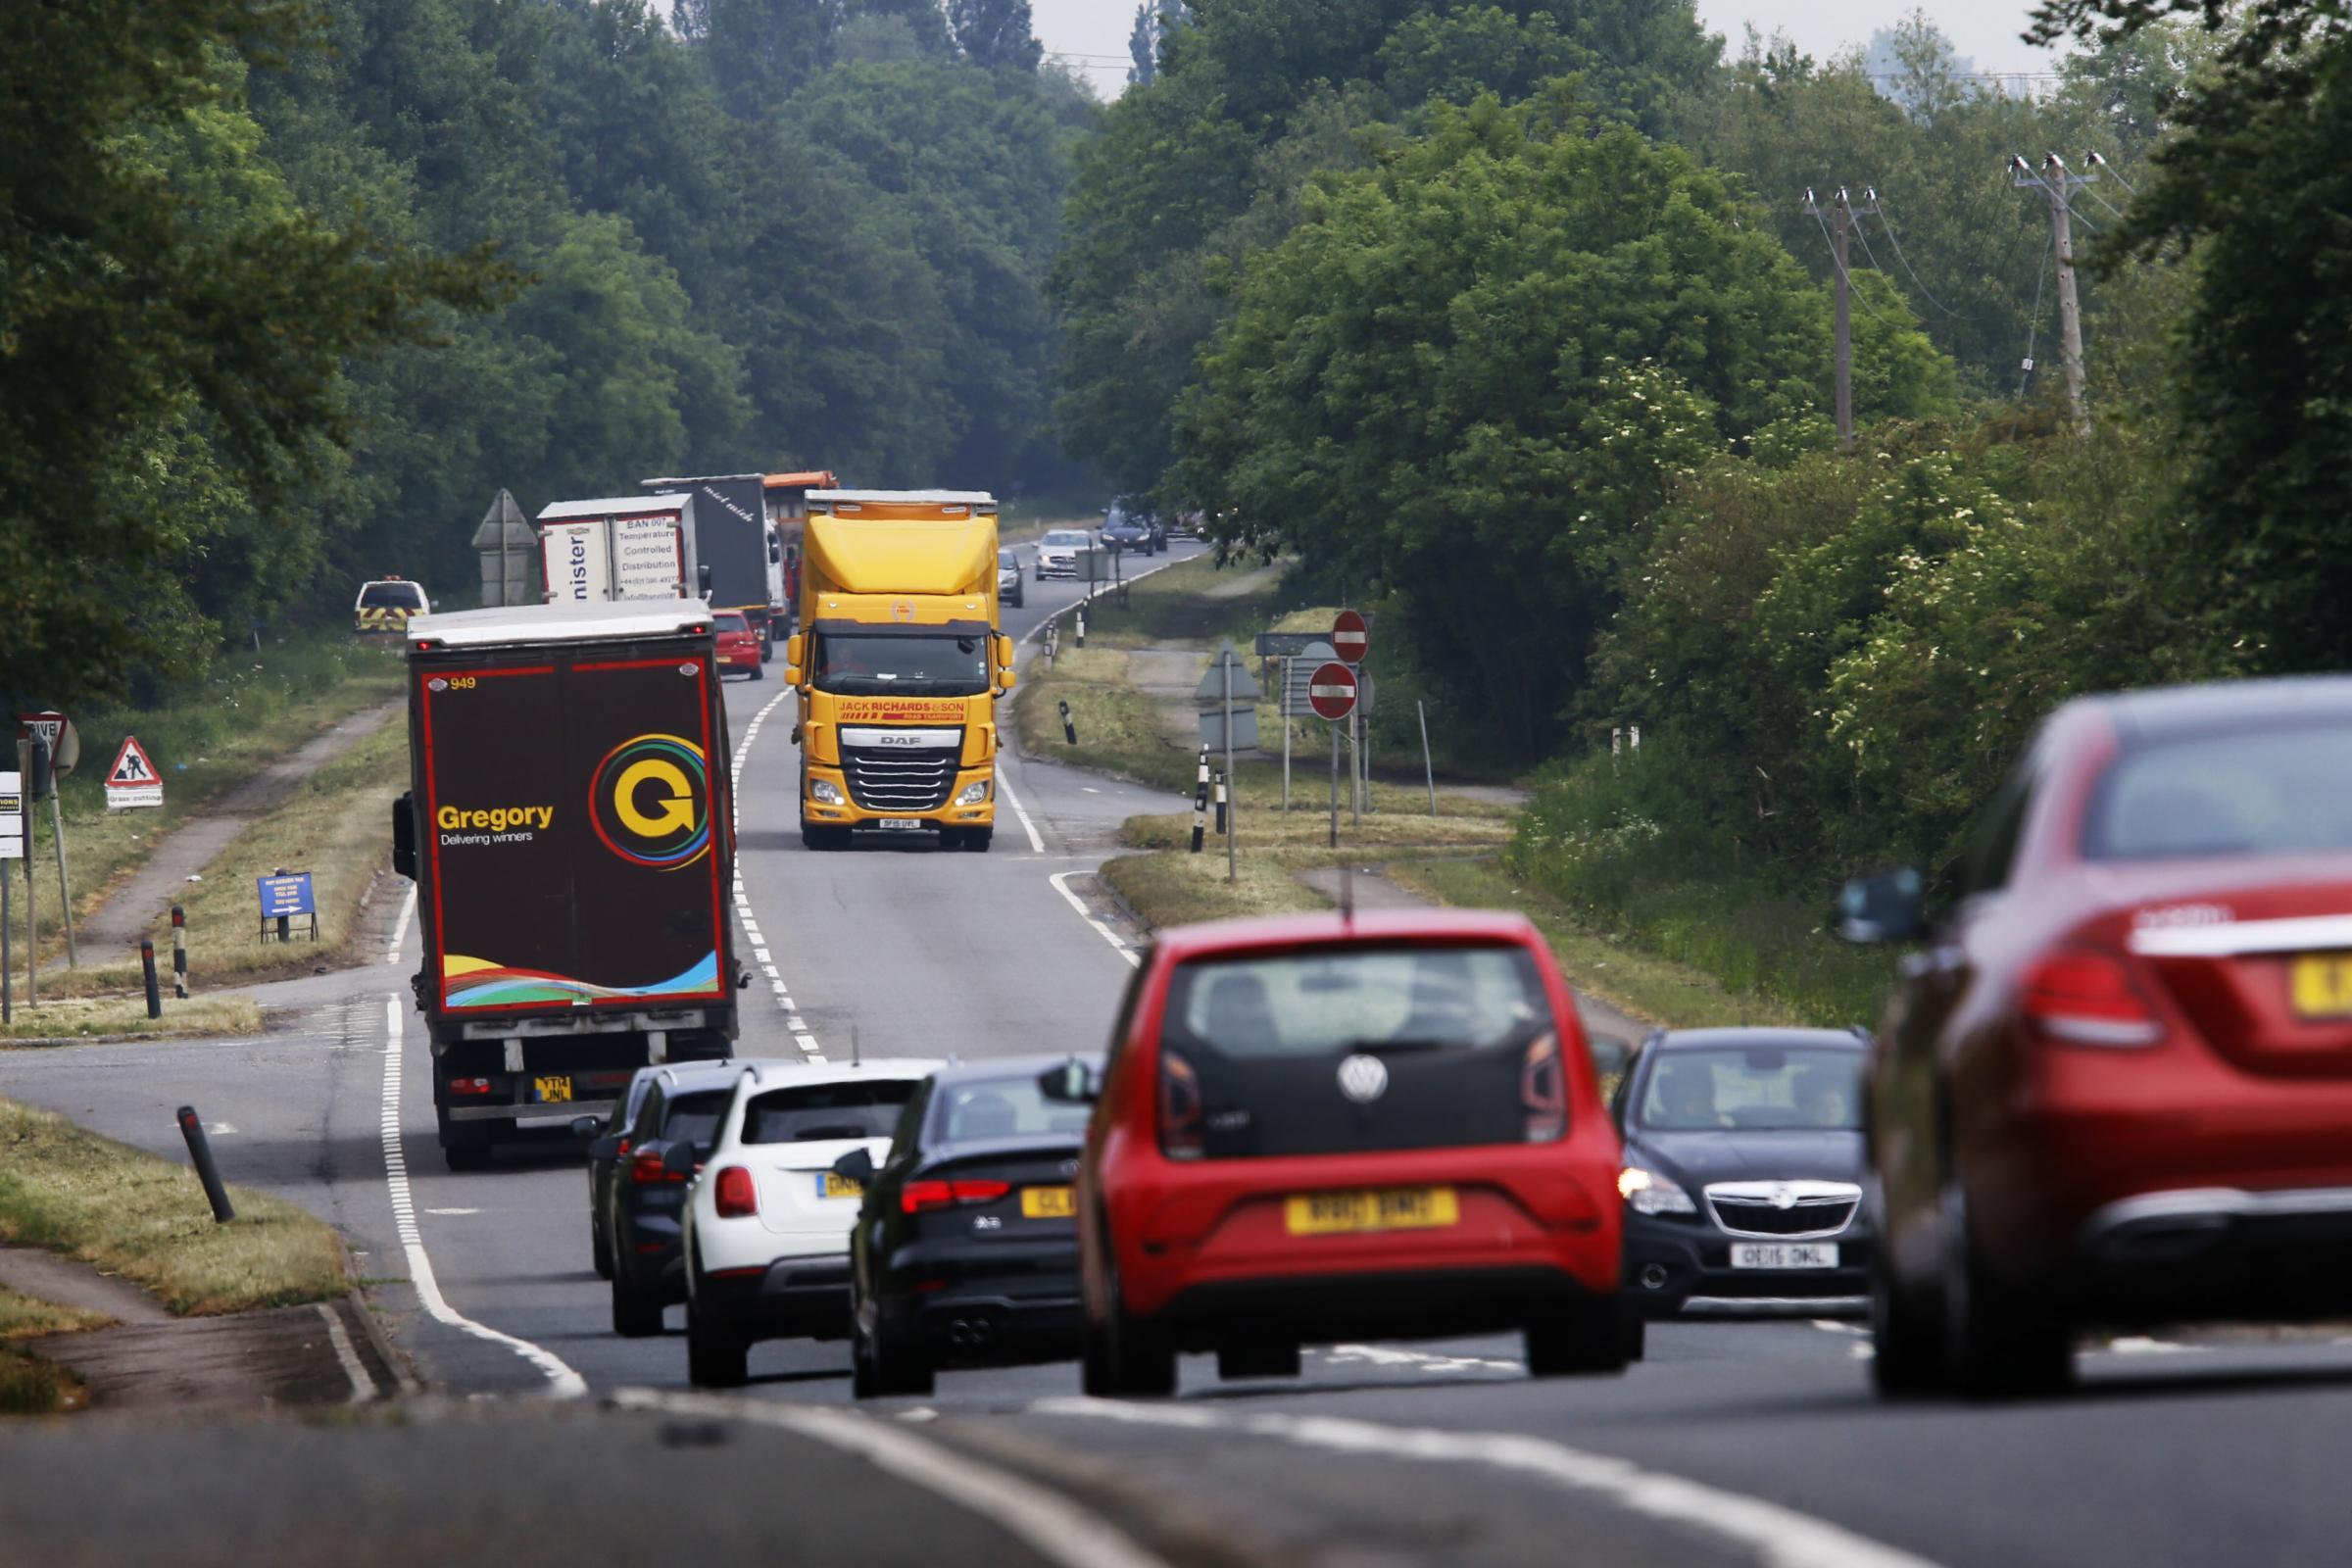 Motorcyclist 'critical' after A40 crash near Witney